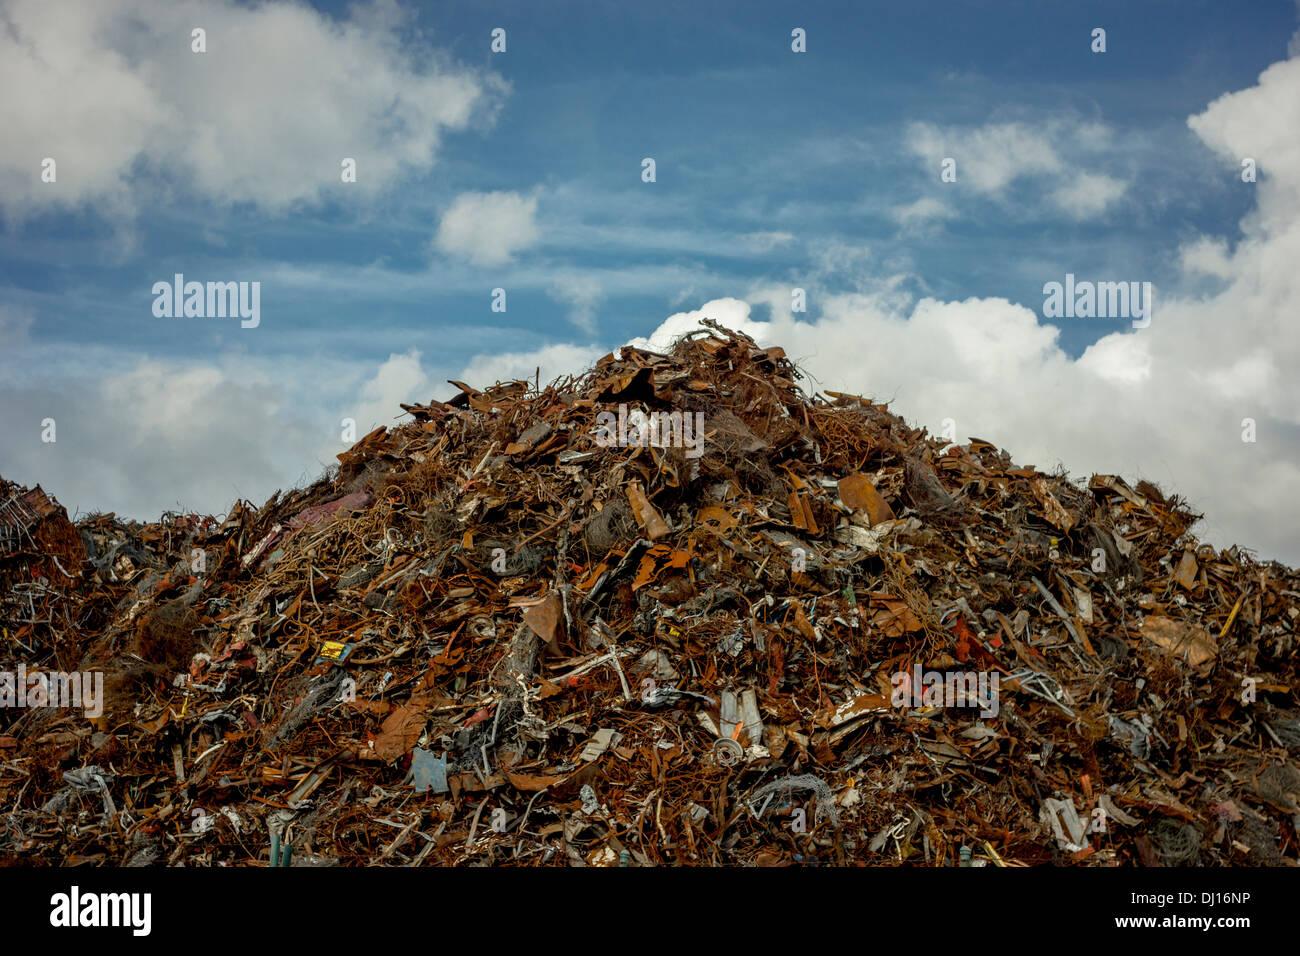 A mountain of scrap metal - Stock Image